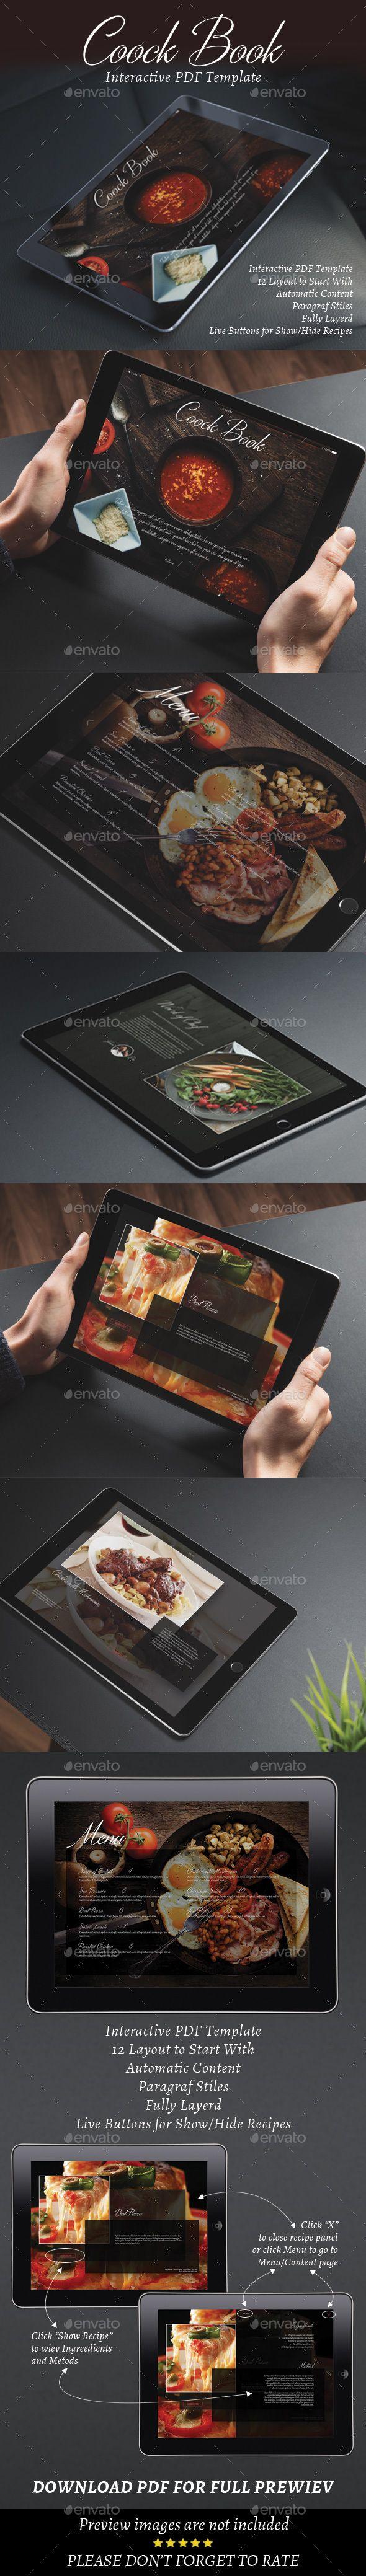 Interactive CookBook or Restaurant Menu Template InDesign INDD #design Download: http://graphicriver.net/item/interactive-cookbook-or-restaurant-menu/13908557?ref=ksioks